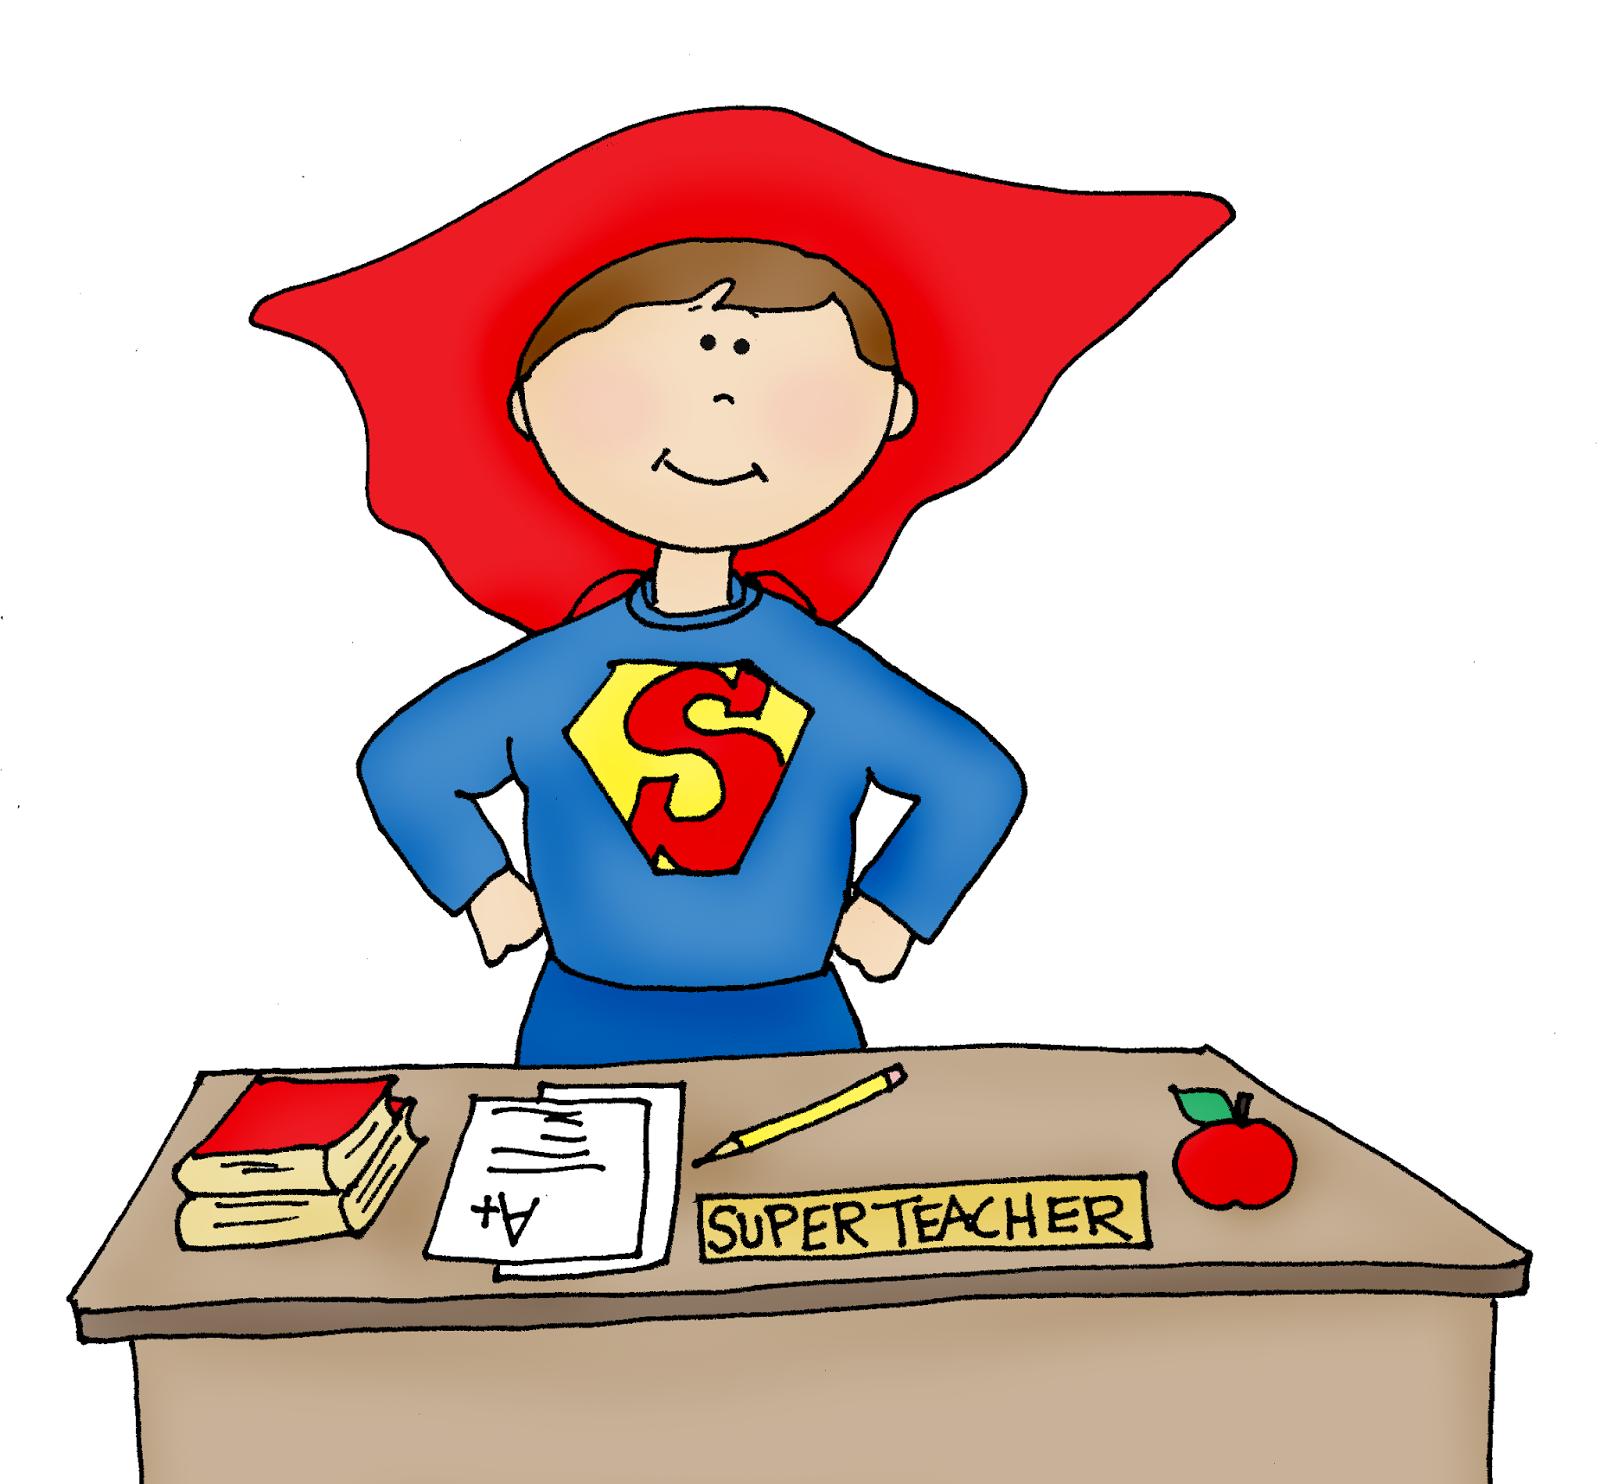 Super Teacher Clipart - Clipart Kid